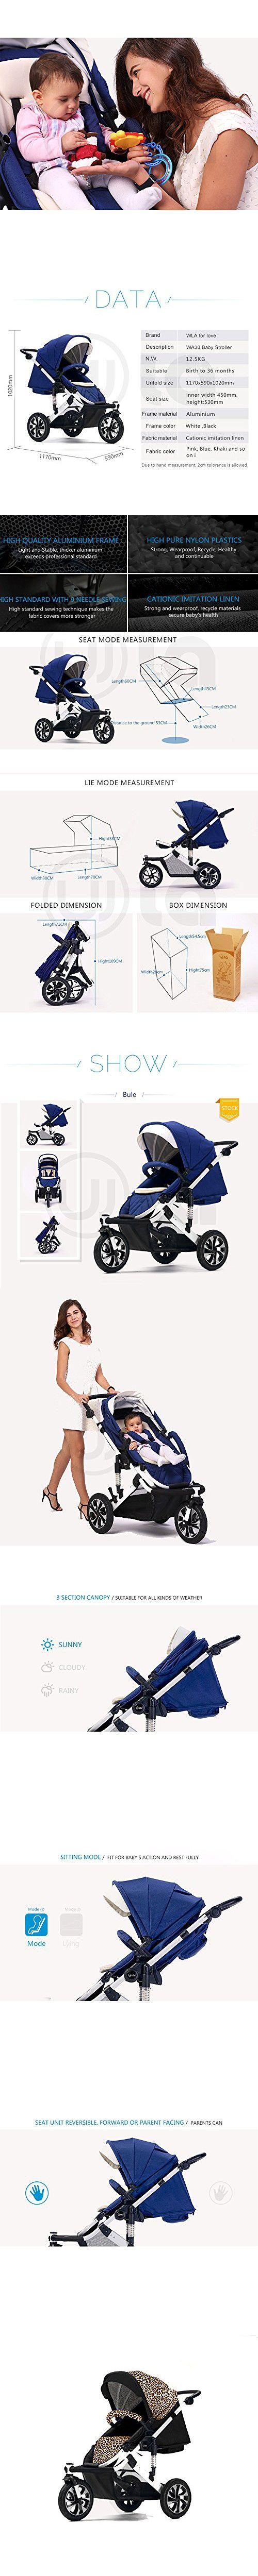 Big ants stroller for baby aluminium frame (Leopard color)